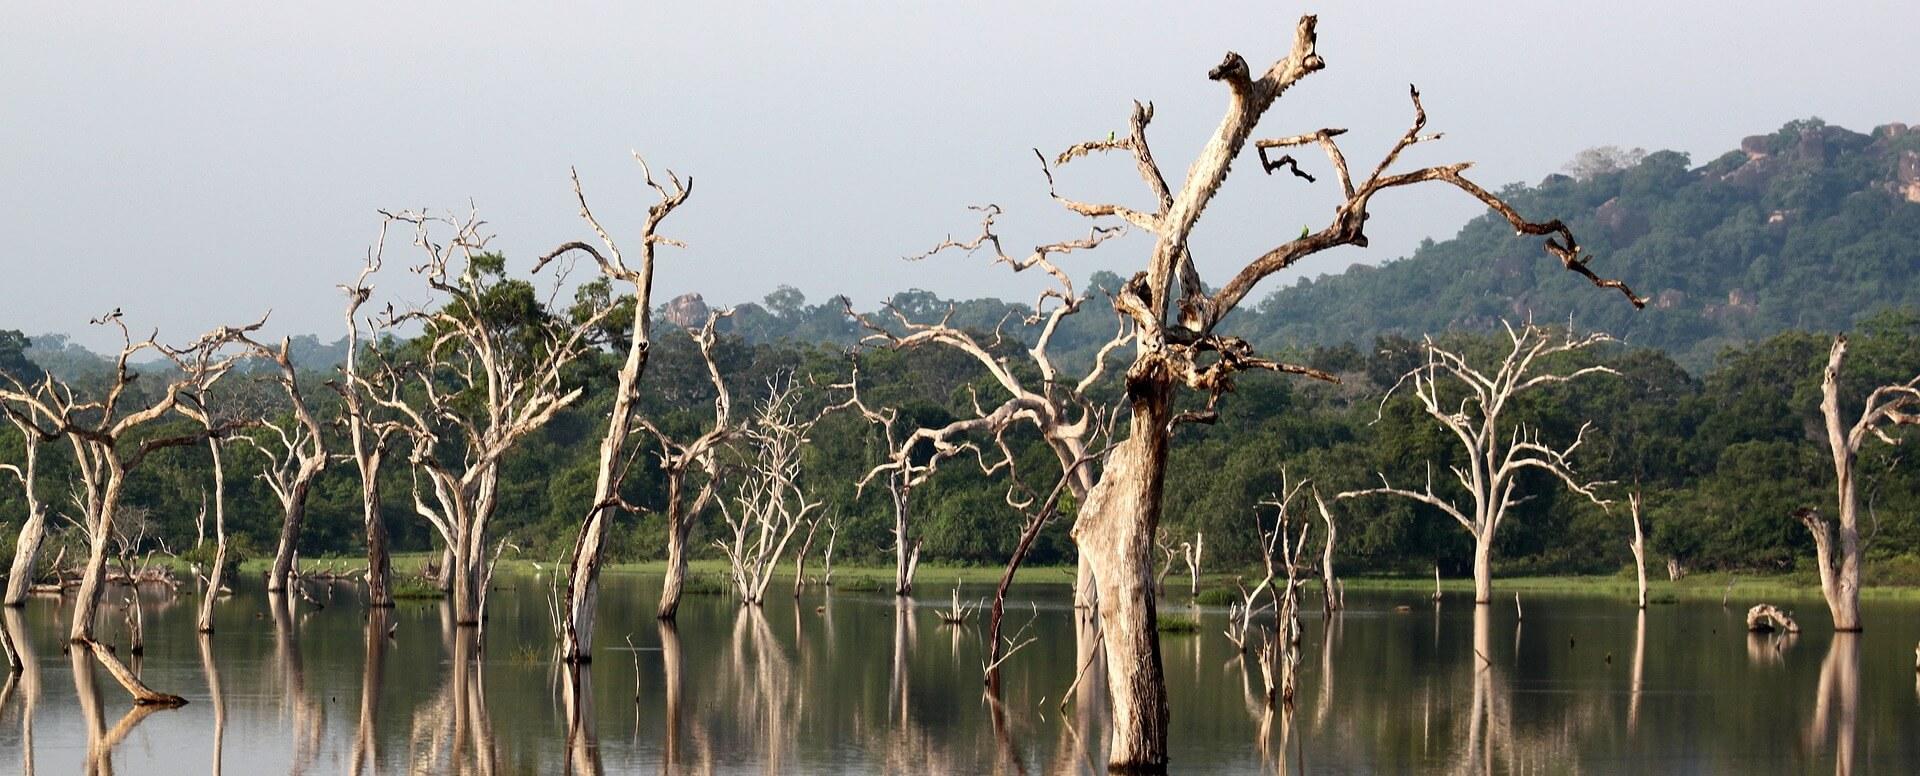 8. Profiter des parcs nationaux - Sri Lanka